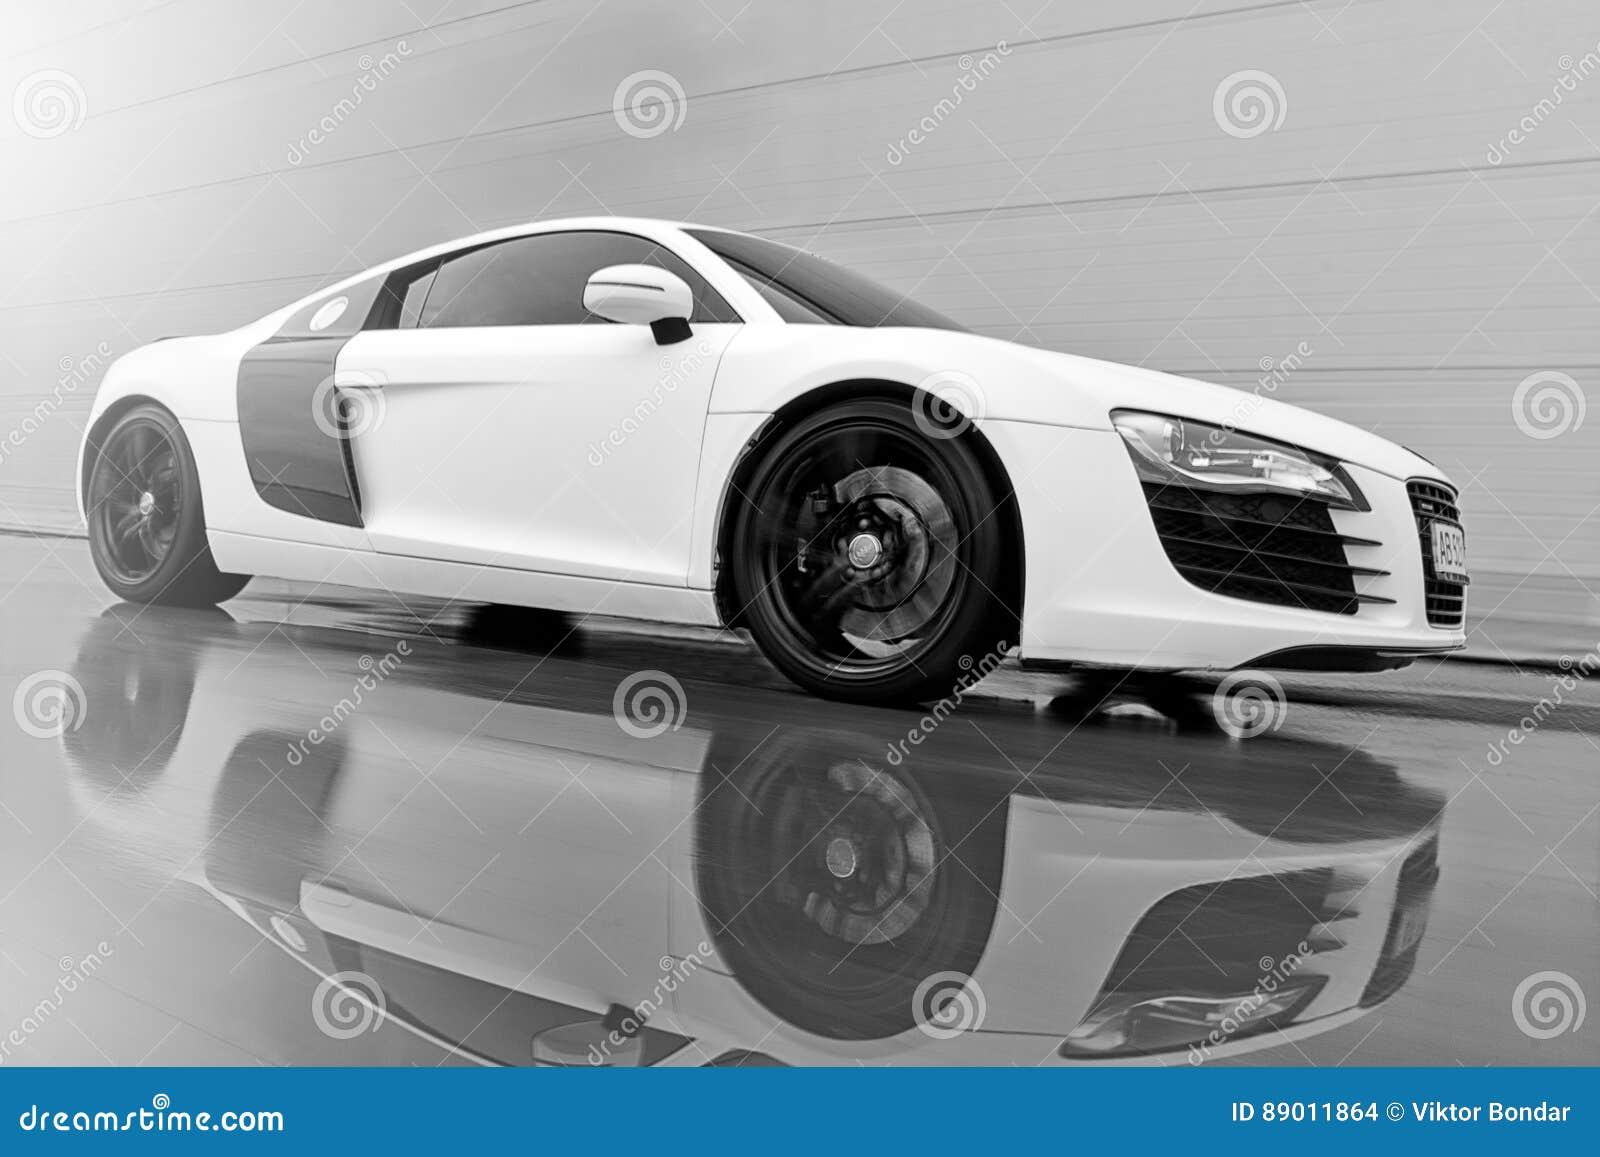 Vinnitsa, Ukraine   November 11, 2012.Audi R8 Concept Car.Audi S